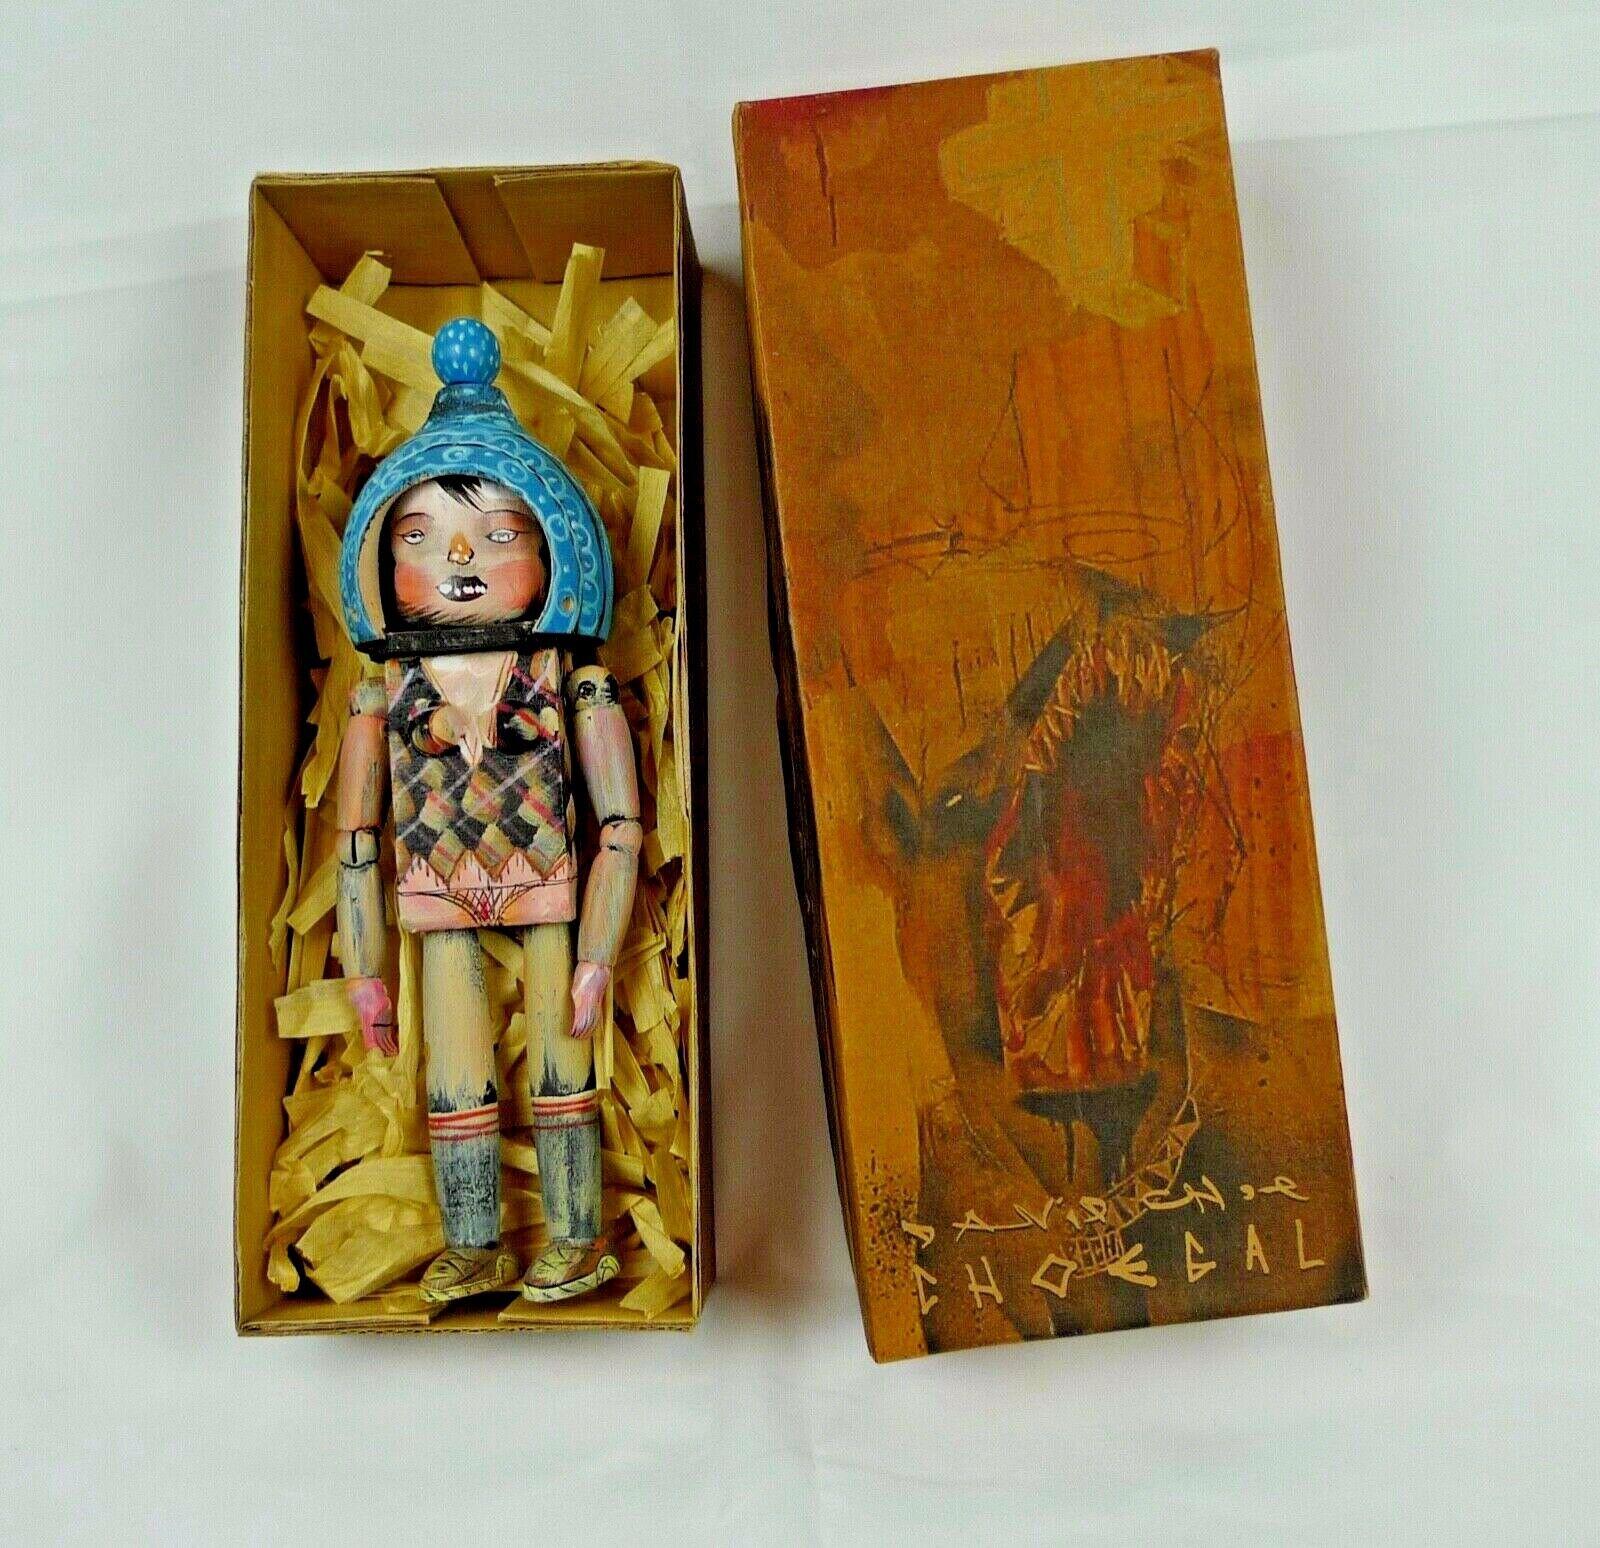 David Choe - CHOEGAL  Ningyoushi 8  Handmade & painted Toy Doll